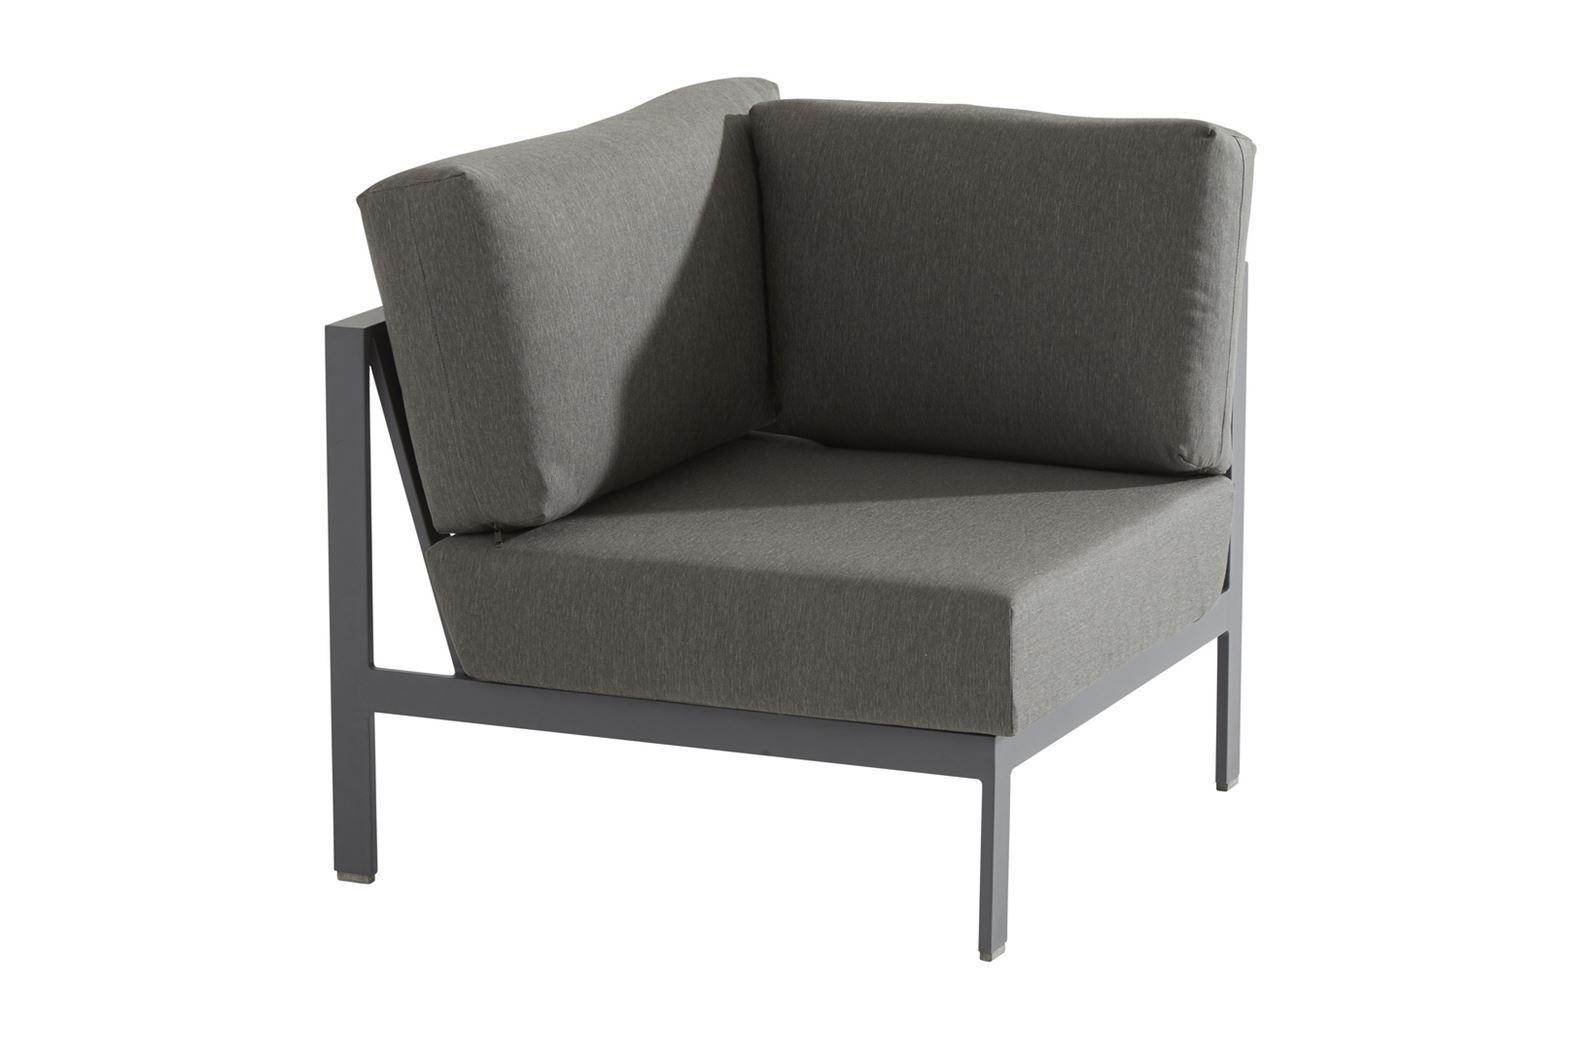 4so montigo modular corner with 3 cushions teak arms matt carbon